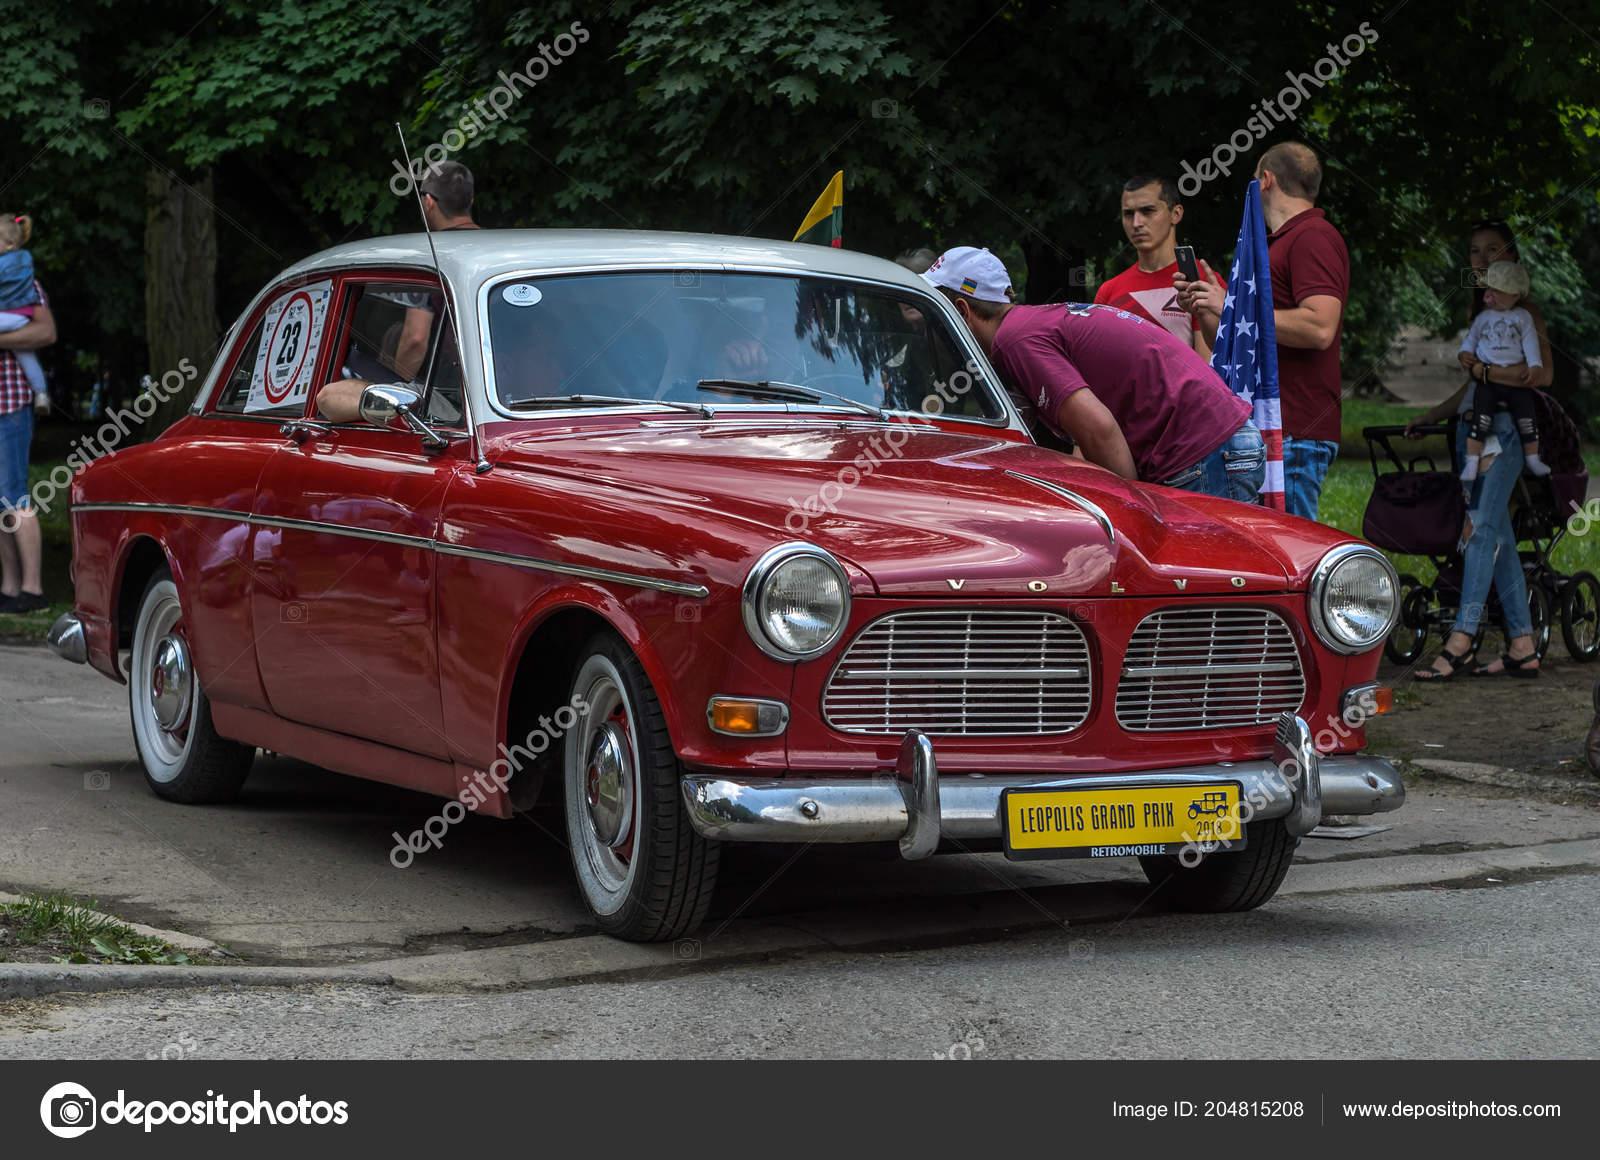 Lviv Ukraine June 2018 Old Vintage Retro Volvo Car Rides